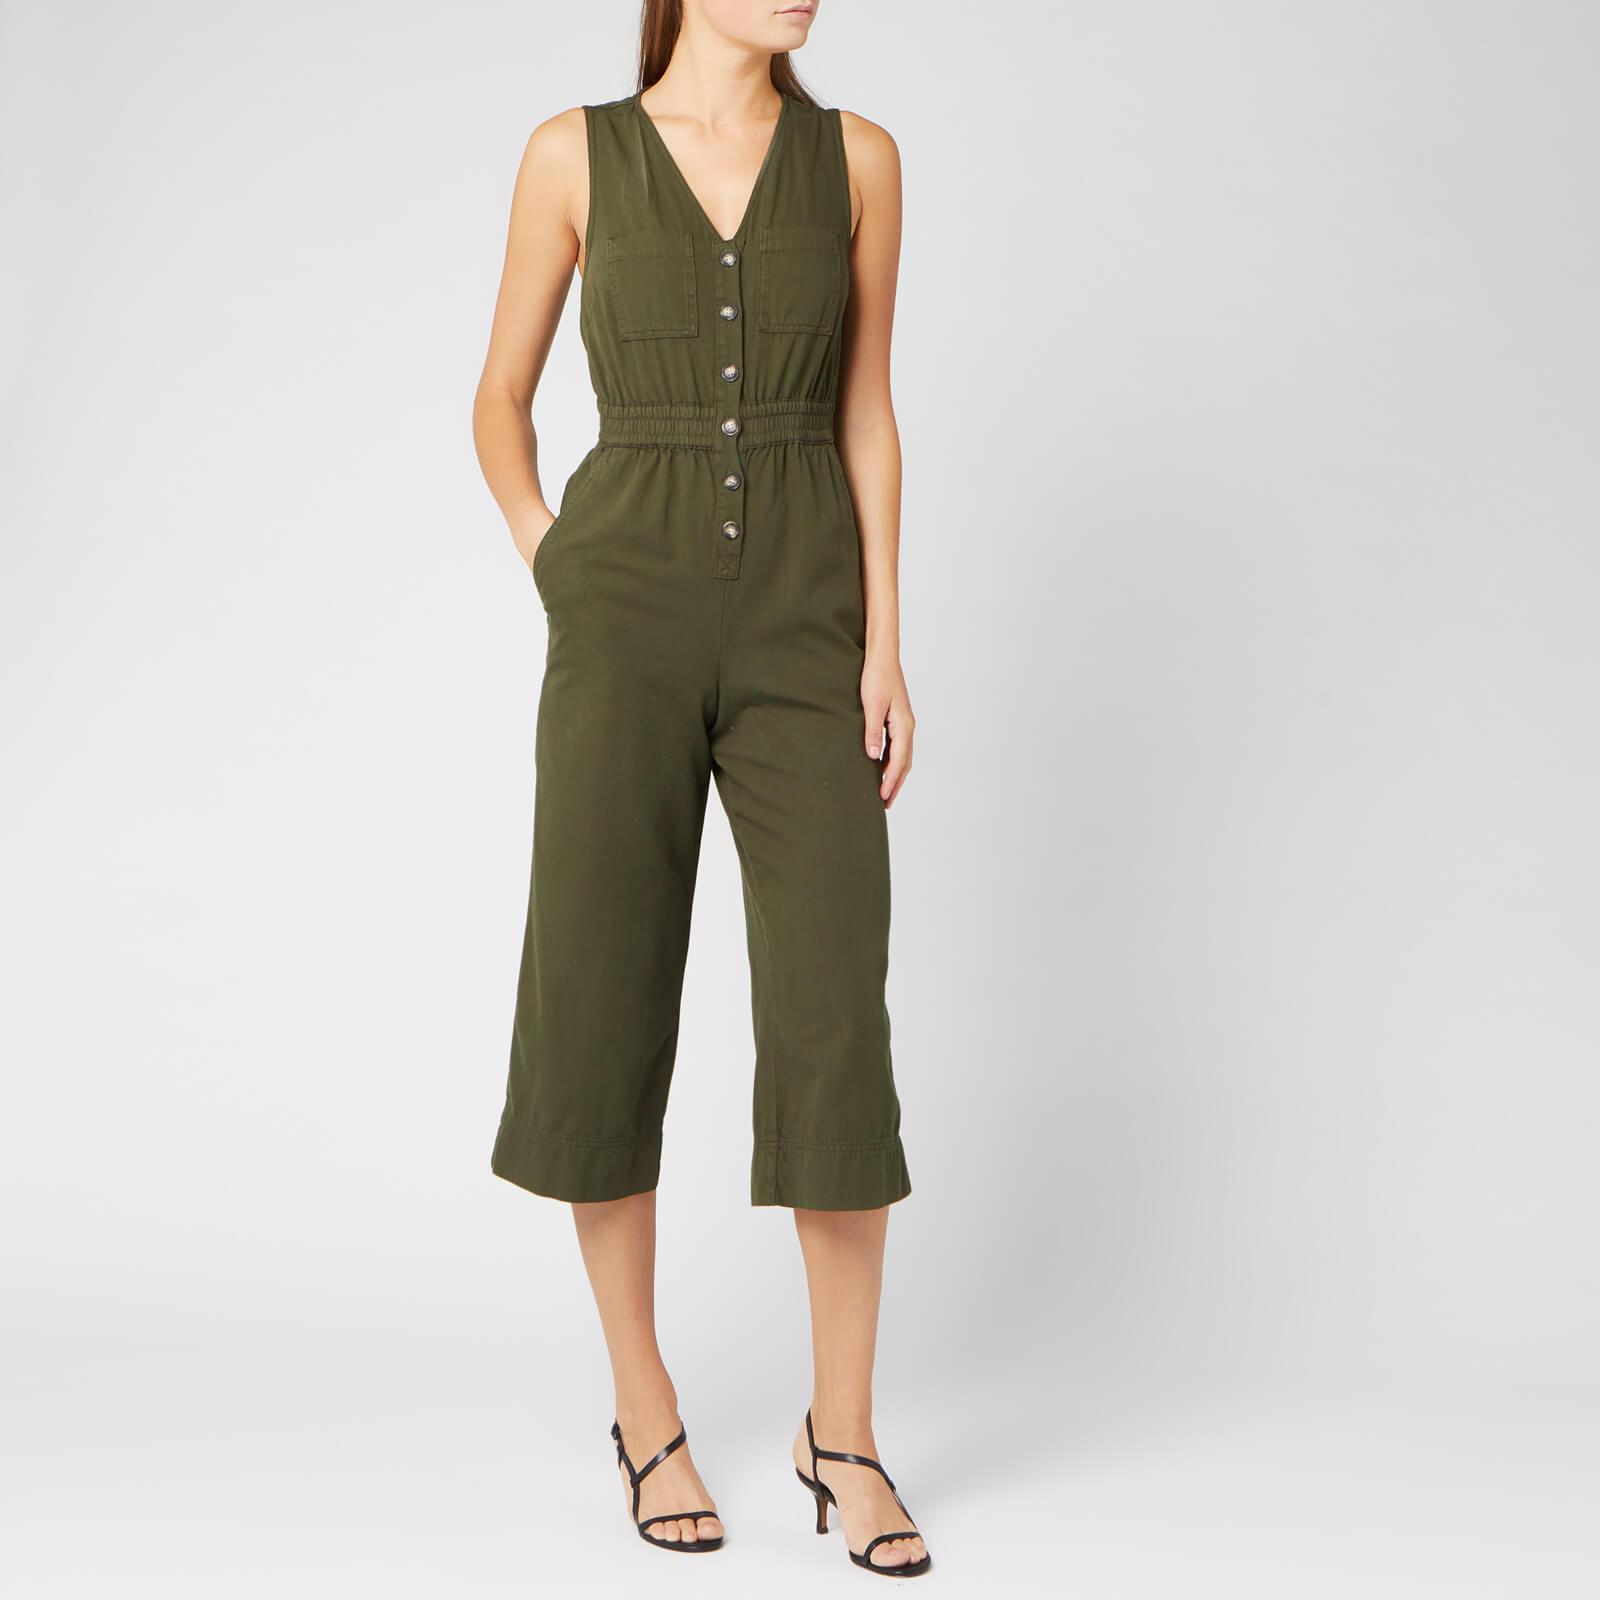 Whistles Women's Ria Denim Jumpsuit - Khaki - UK 12 - Green